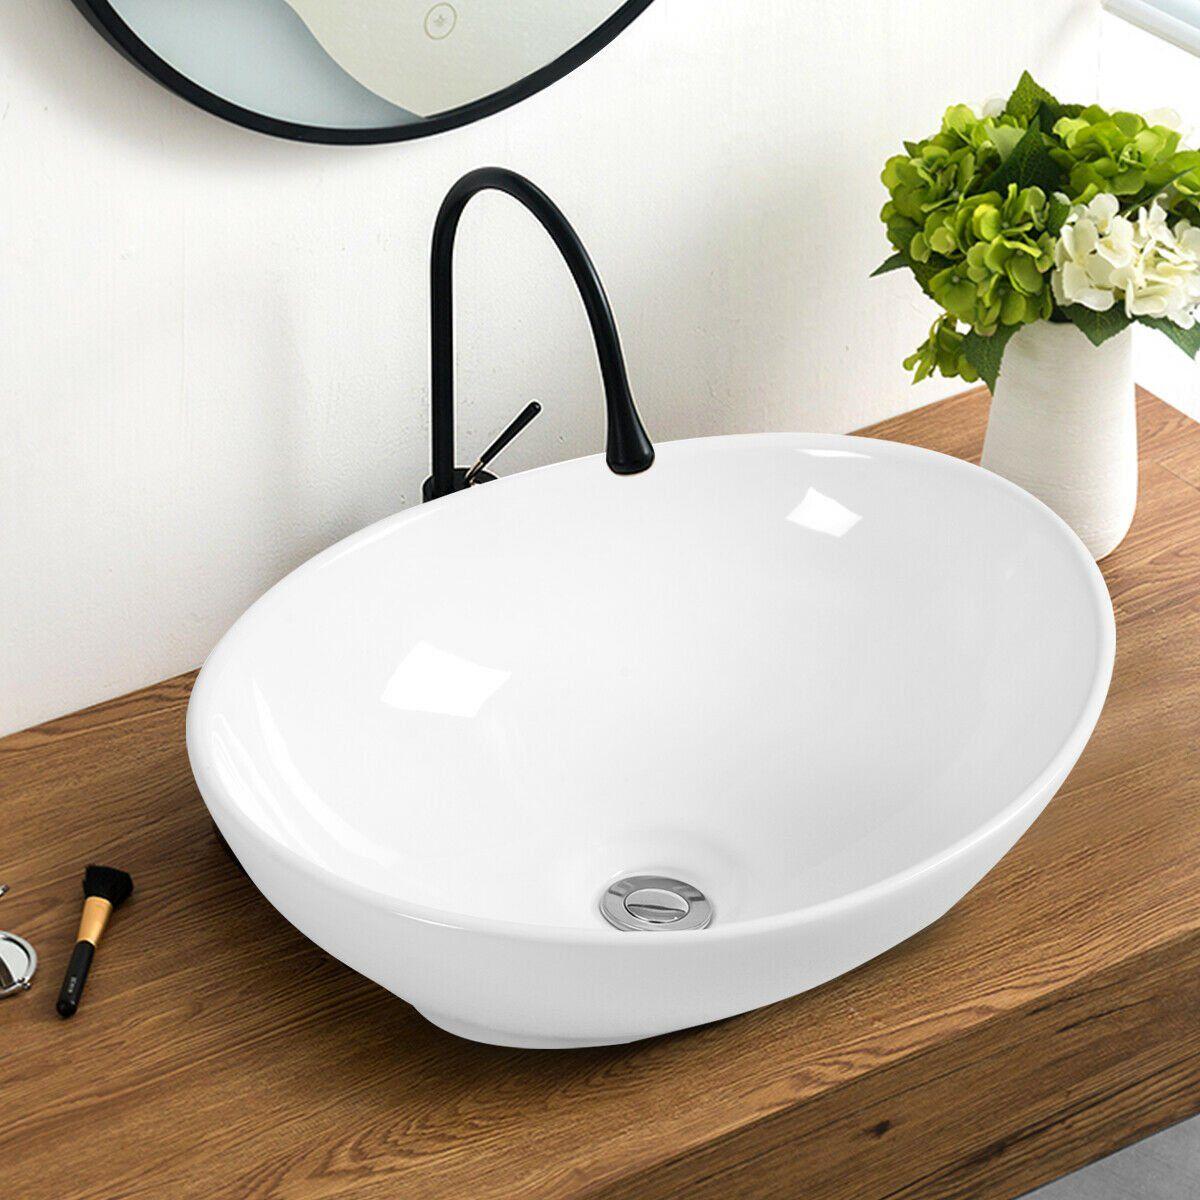 Costway Oval Bathroom Basin Ceramic Vessel Sink Bowl Vanity Porcelain W Pop Up Drain Walmart Com Vessel Sink Bowls Bathroom Sink Bowls Vessel Sink Bathroom